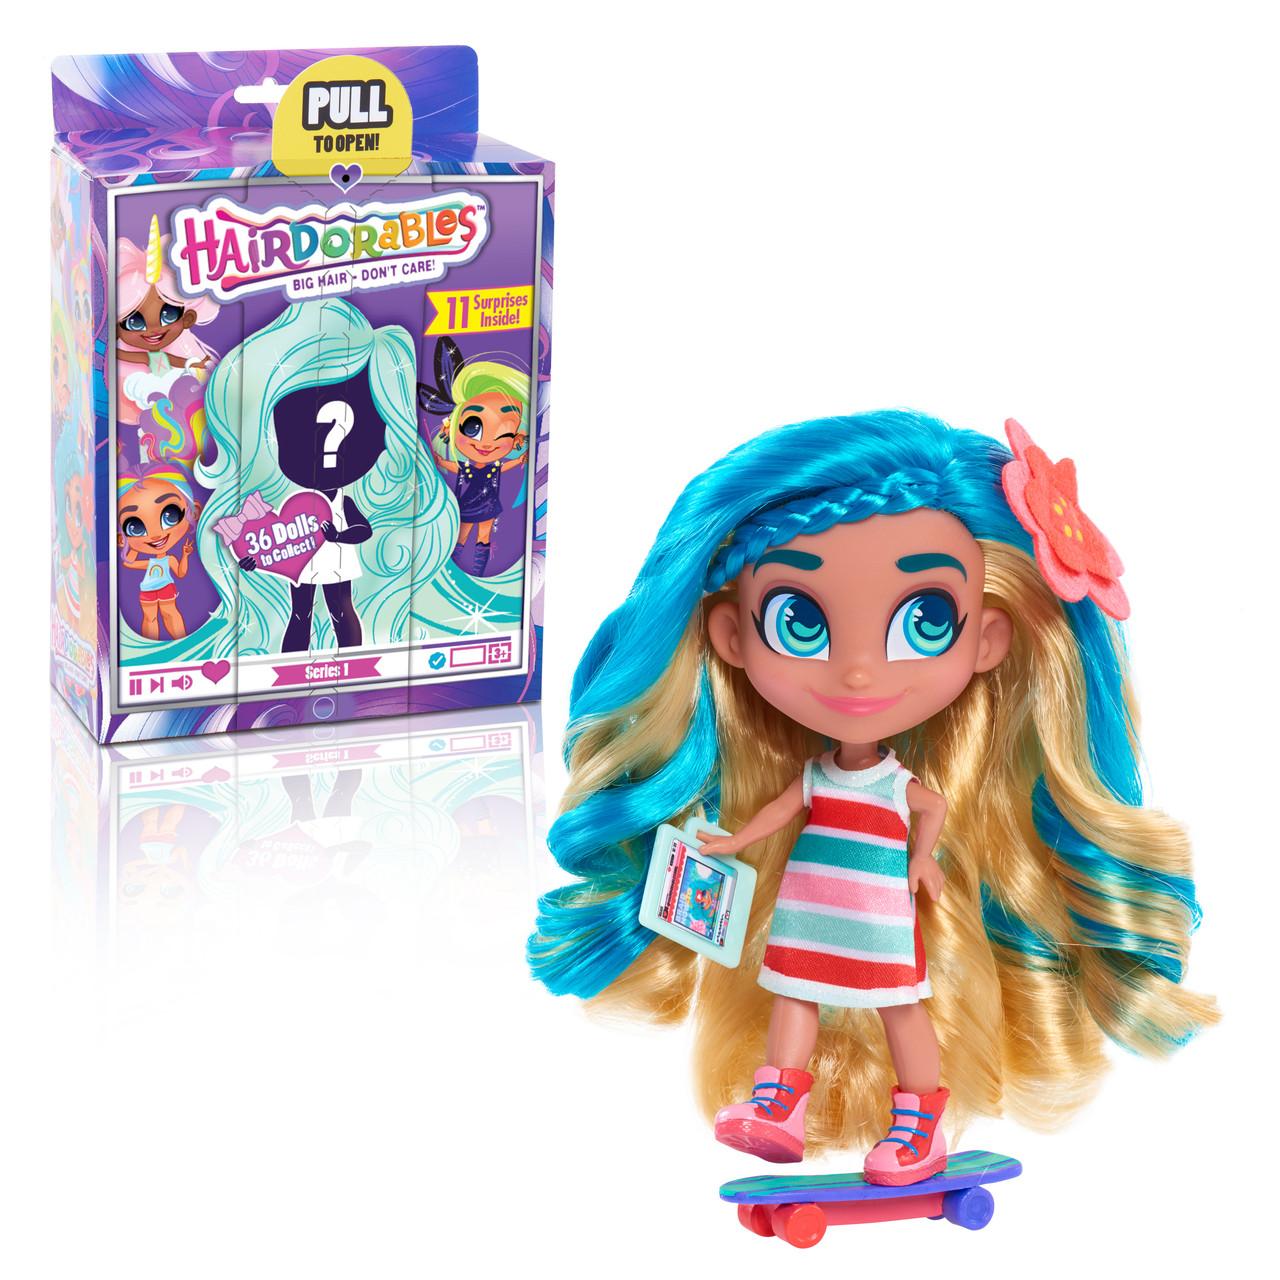 Кукла сюрприз Хэрдораблс Hairdorables Collectible Dolls